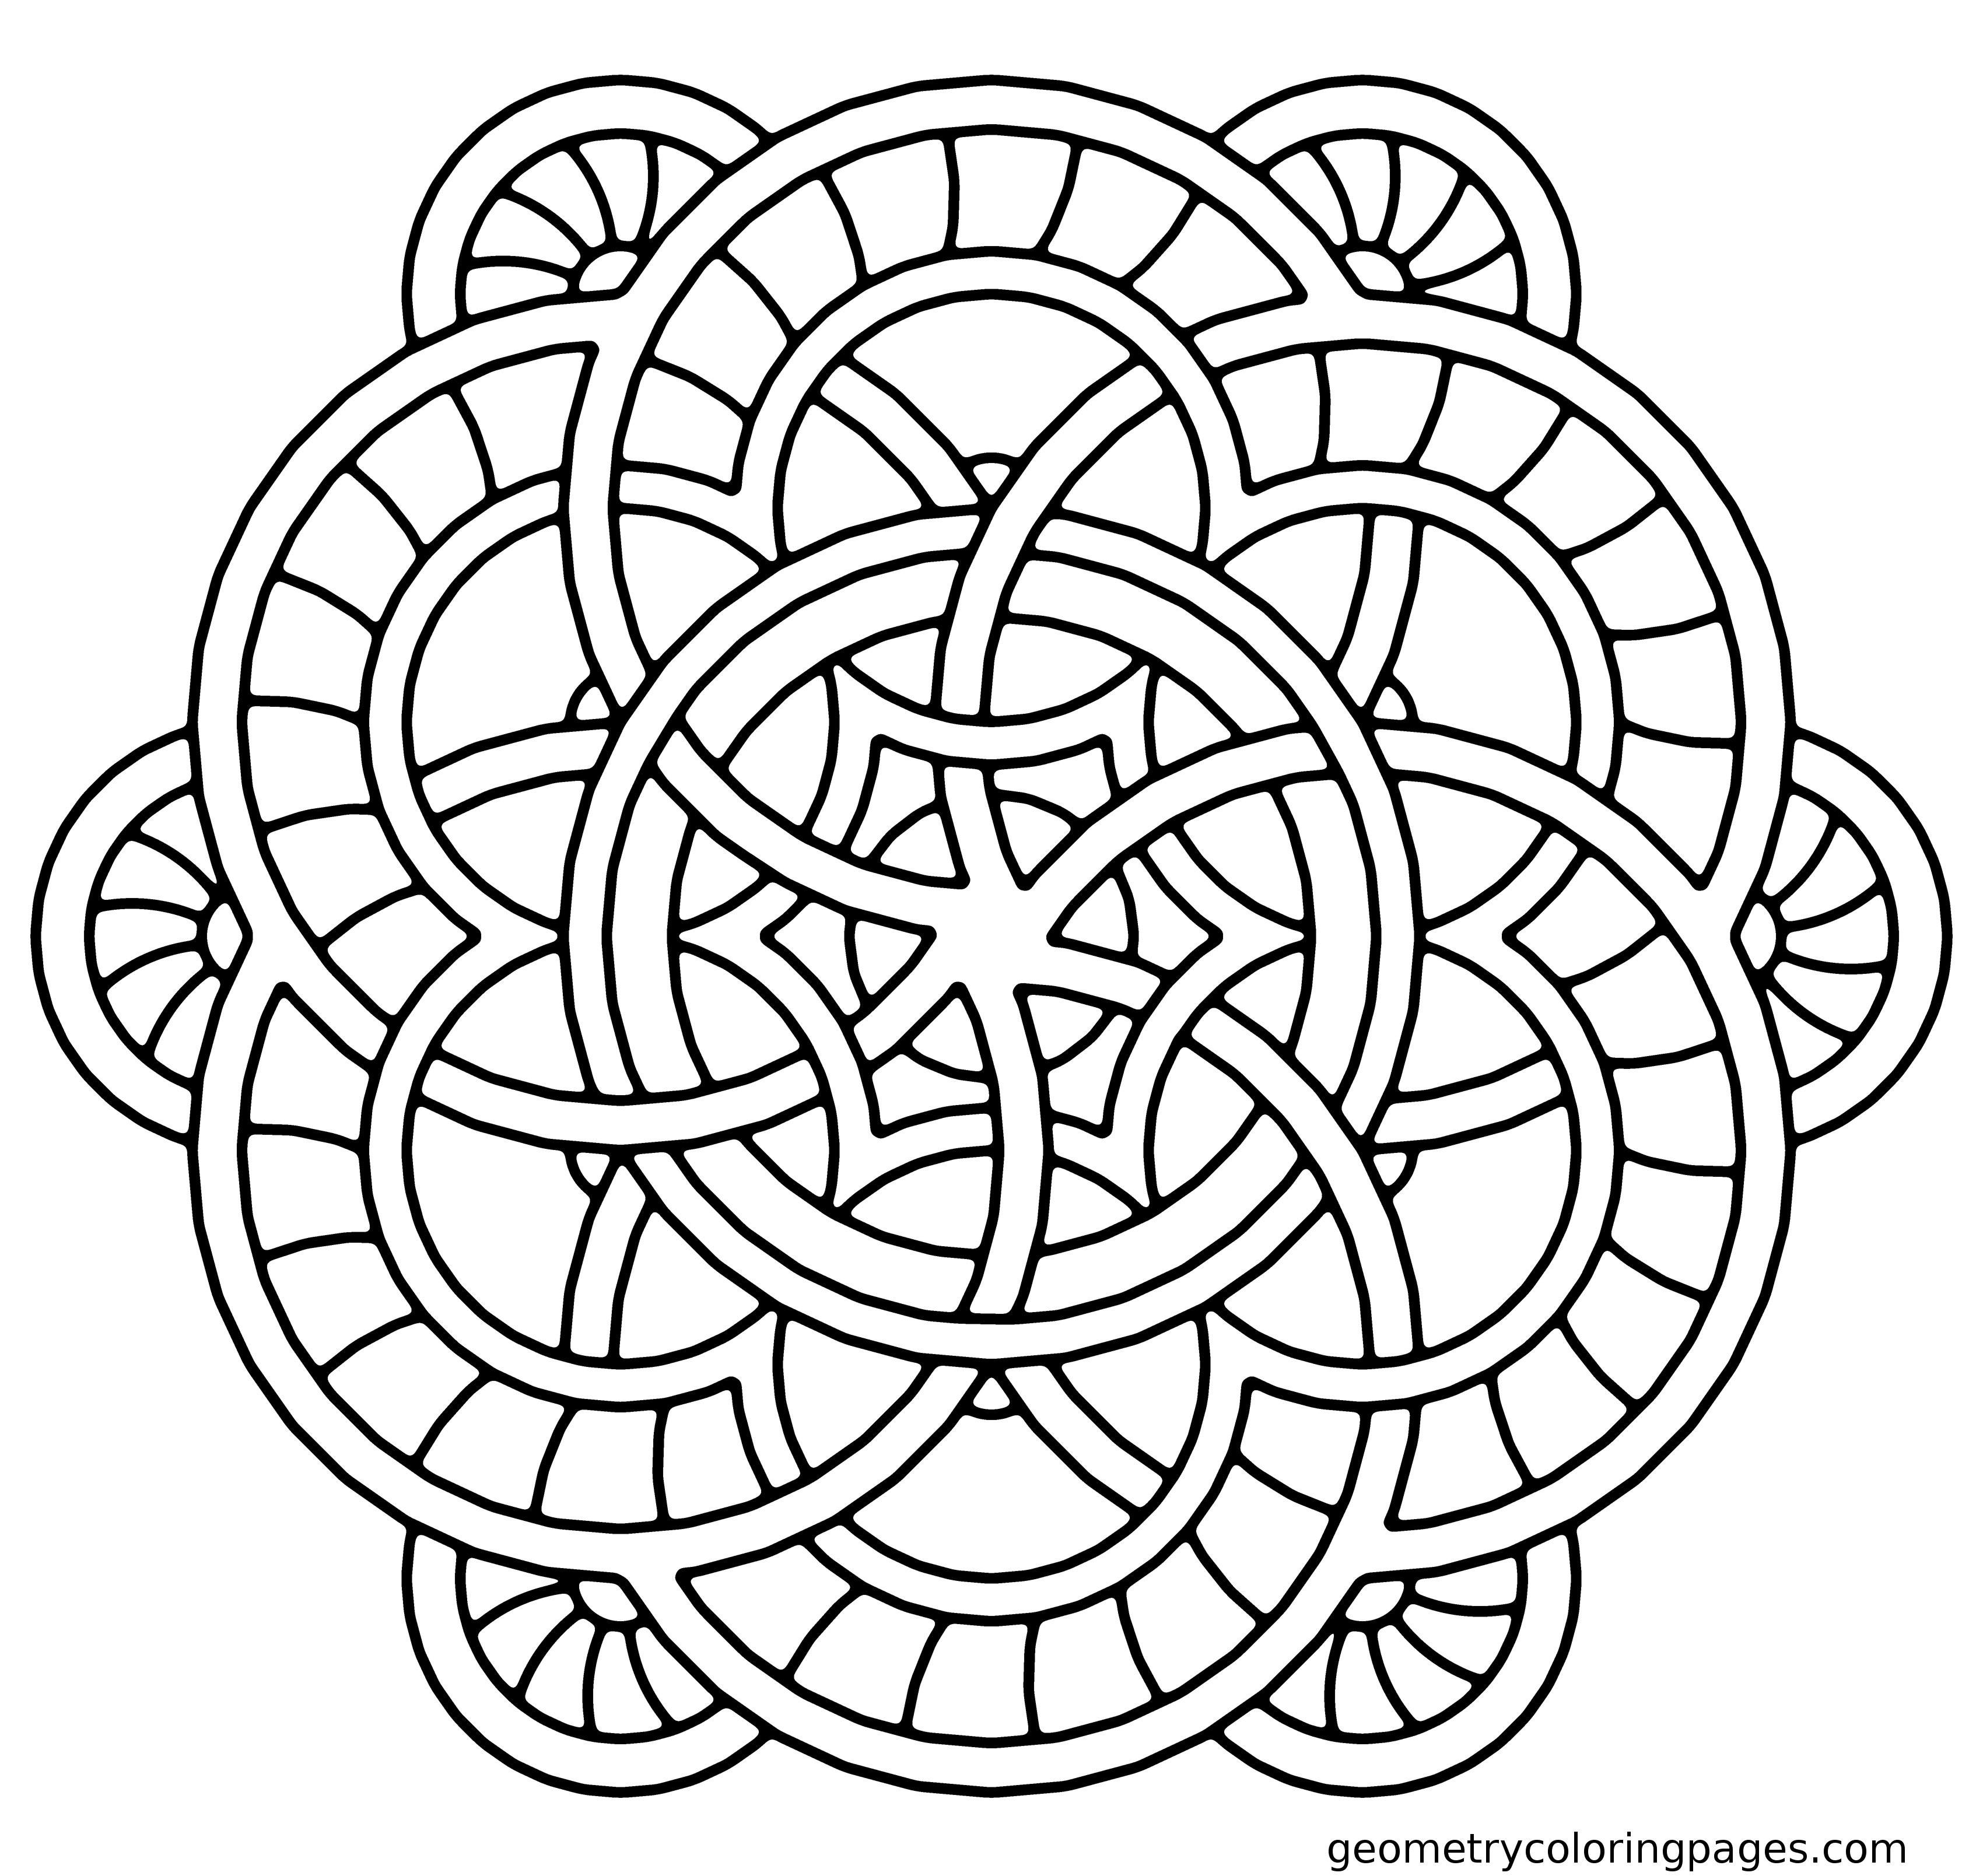 Mandala Art Drawing at GetDrawings.com | Free for personal use ...